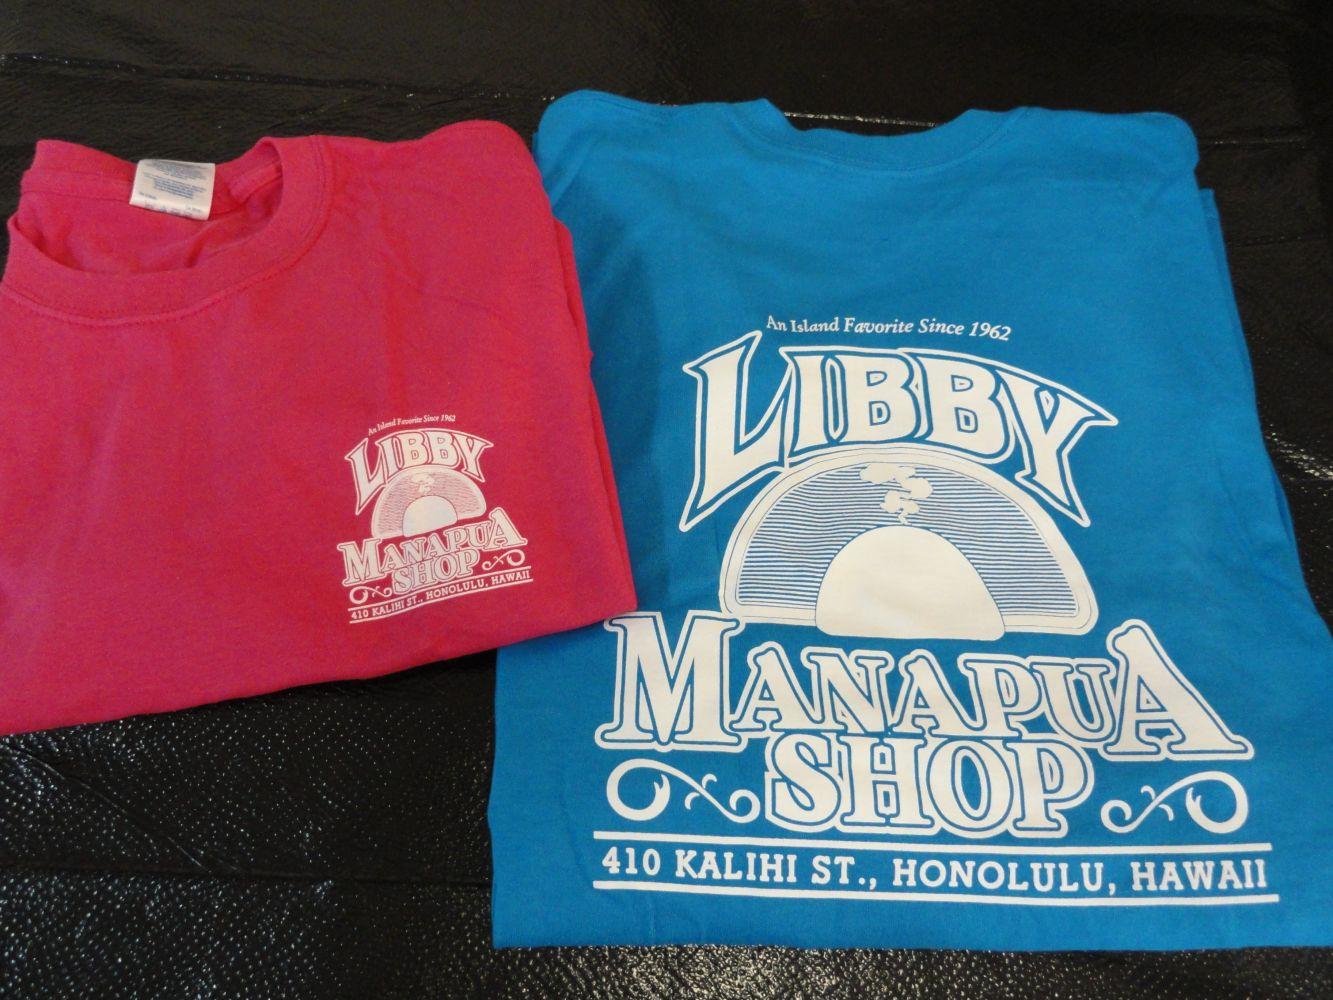 Manapua delivery in Honolulu, HI